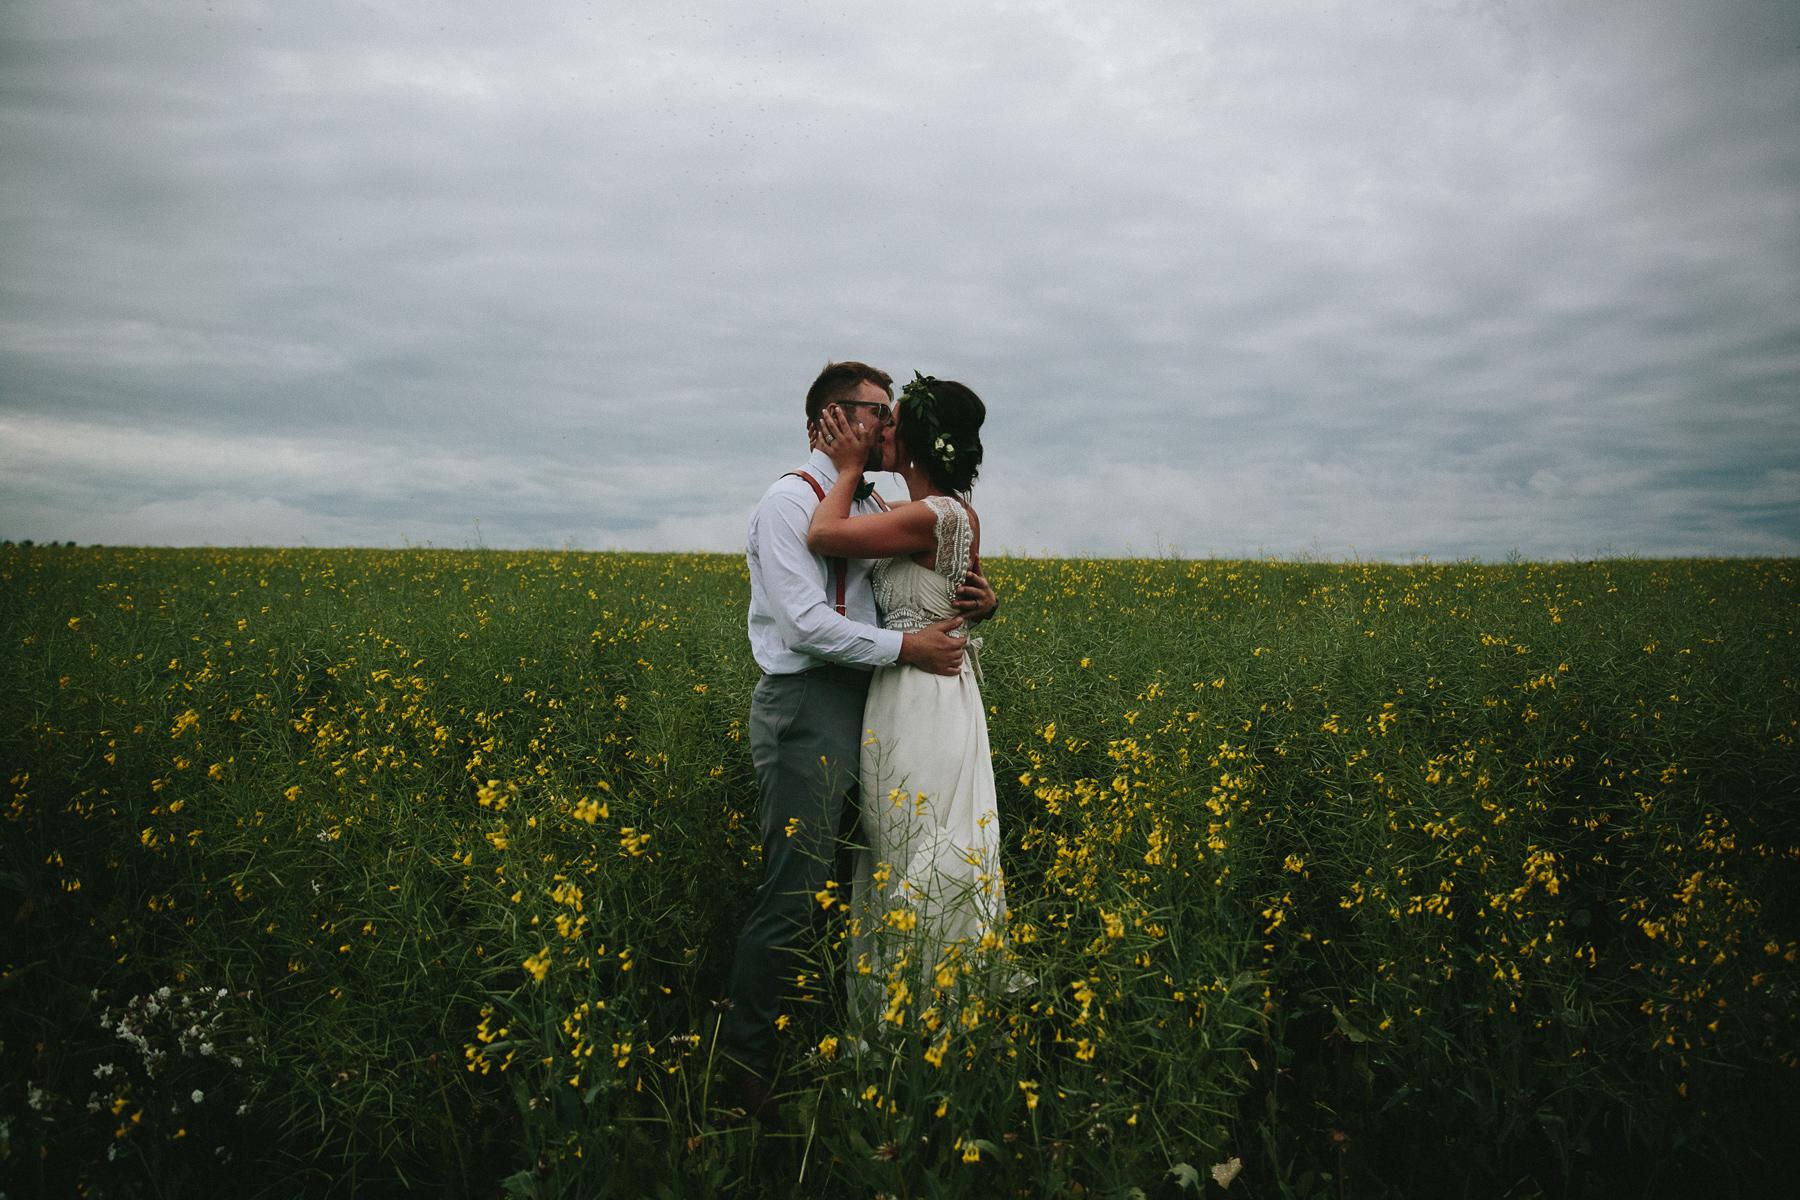 alberta-farm-wedding-photographer-rp-wj-229.jpg